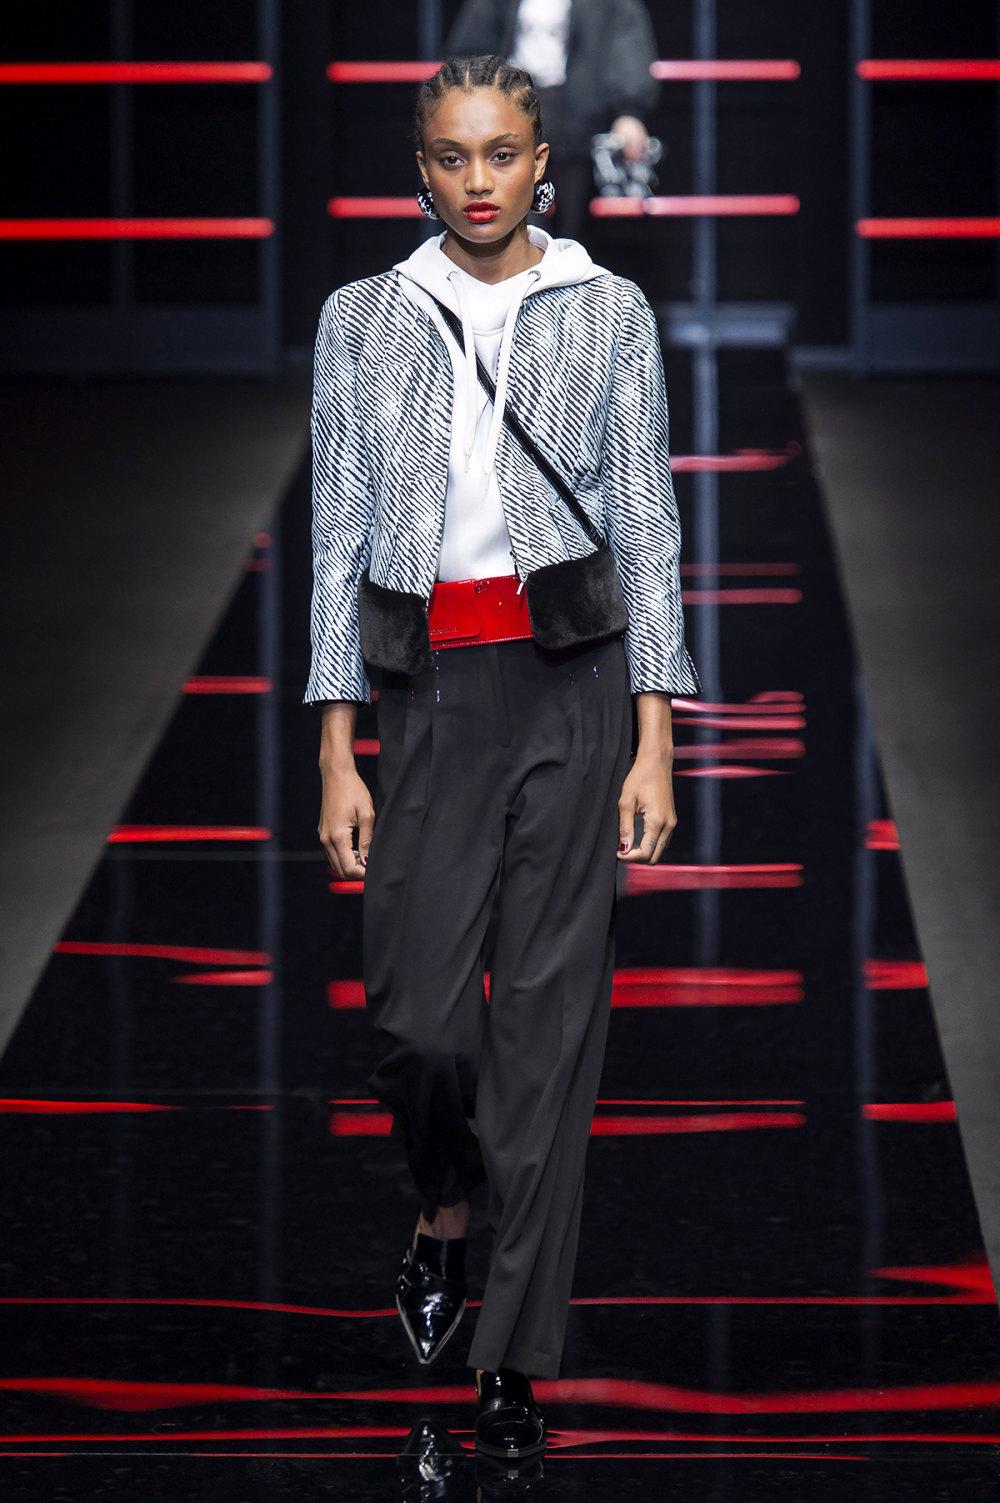 Emporio Armani时装系列畅的裤子带有柔滑裙子的鸡尾酒礼服-19.jpg